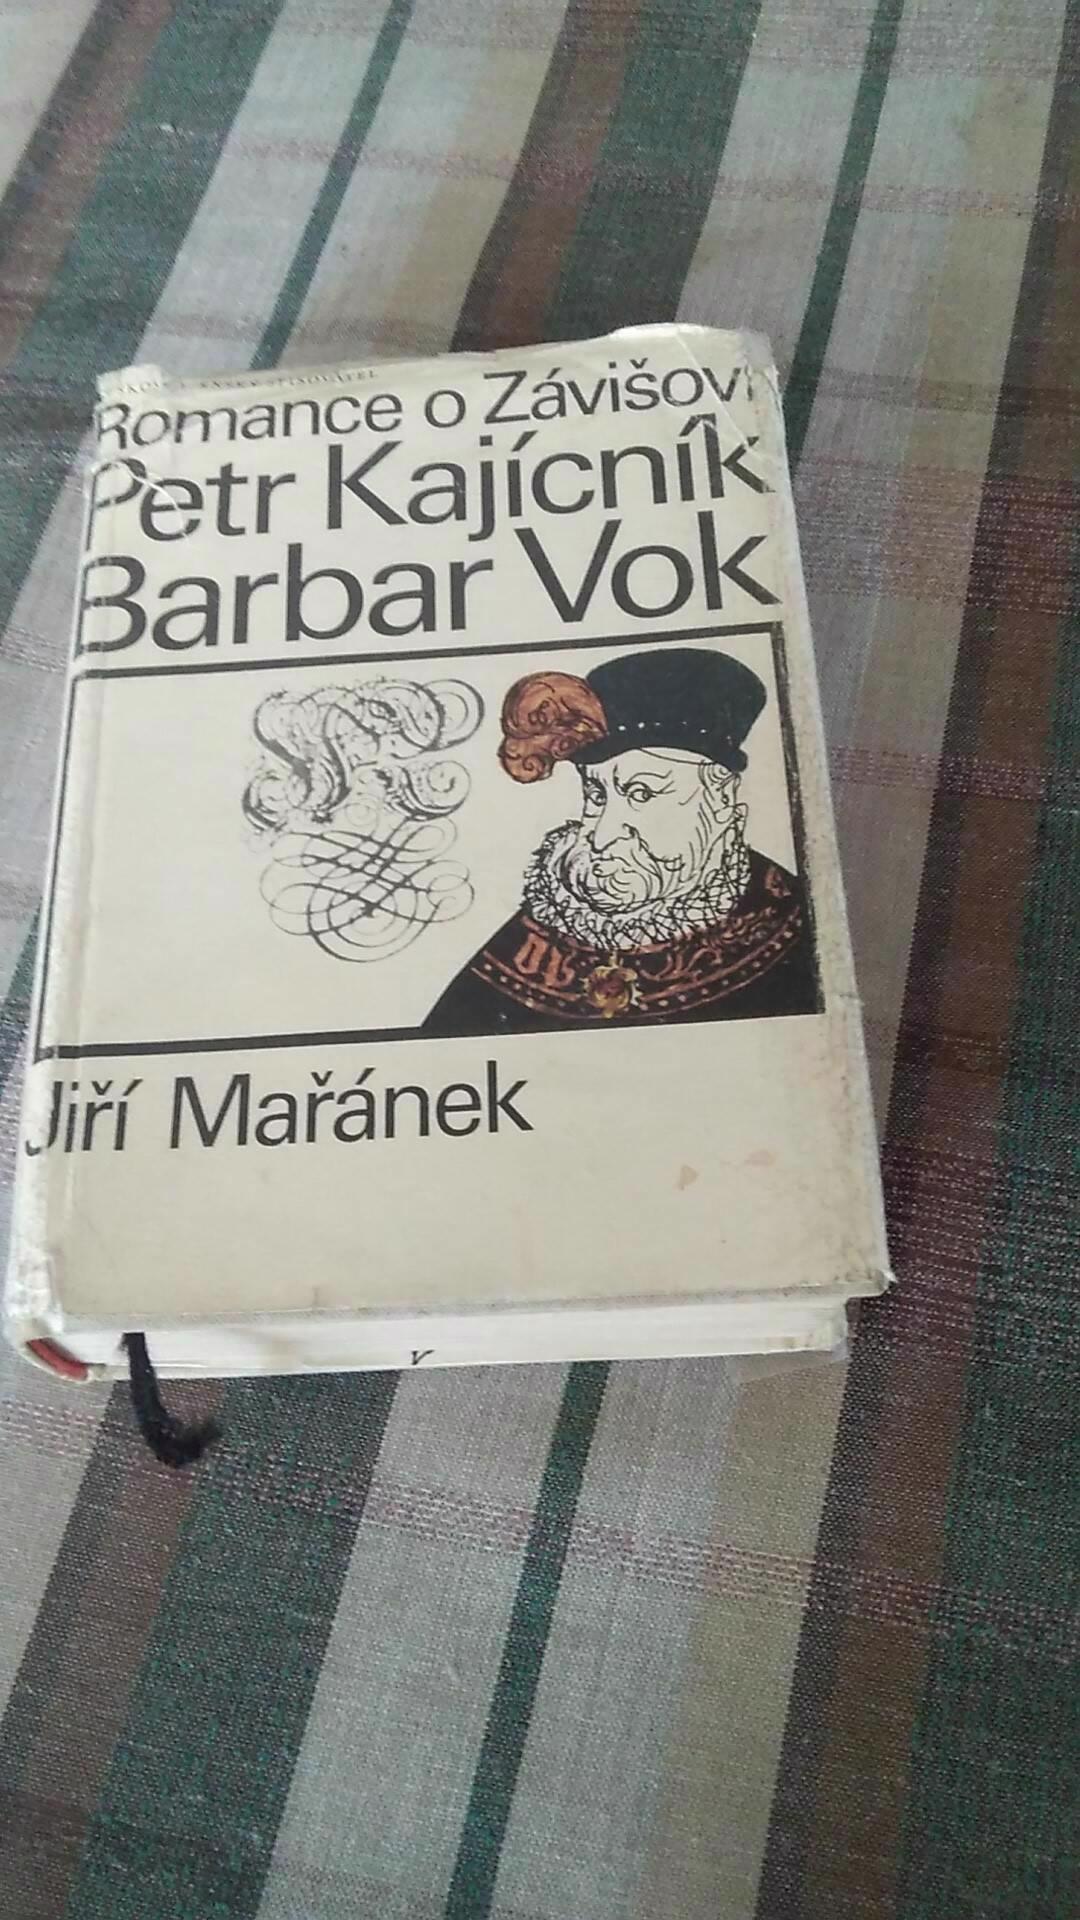 Romance o Závišovi, Petr Kajícník, Barbar Vok - trilogie - foto 1